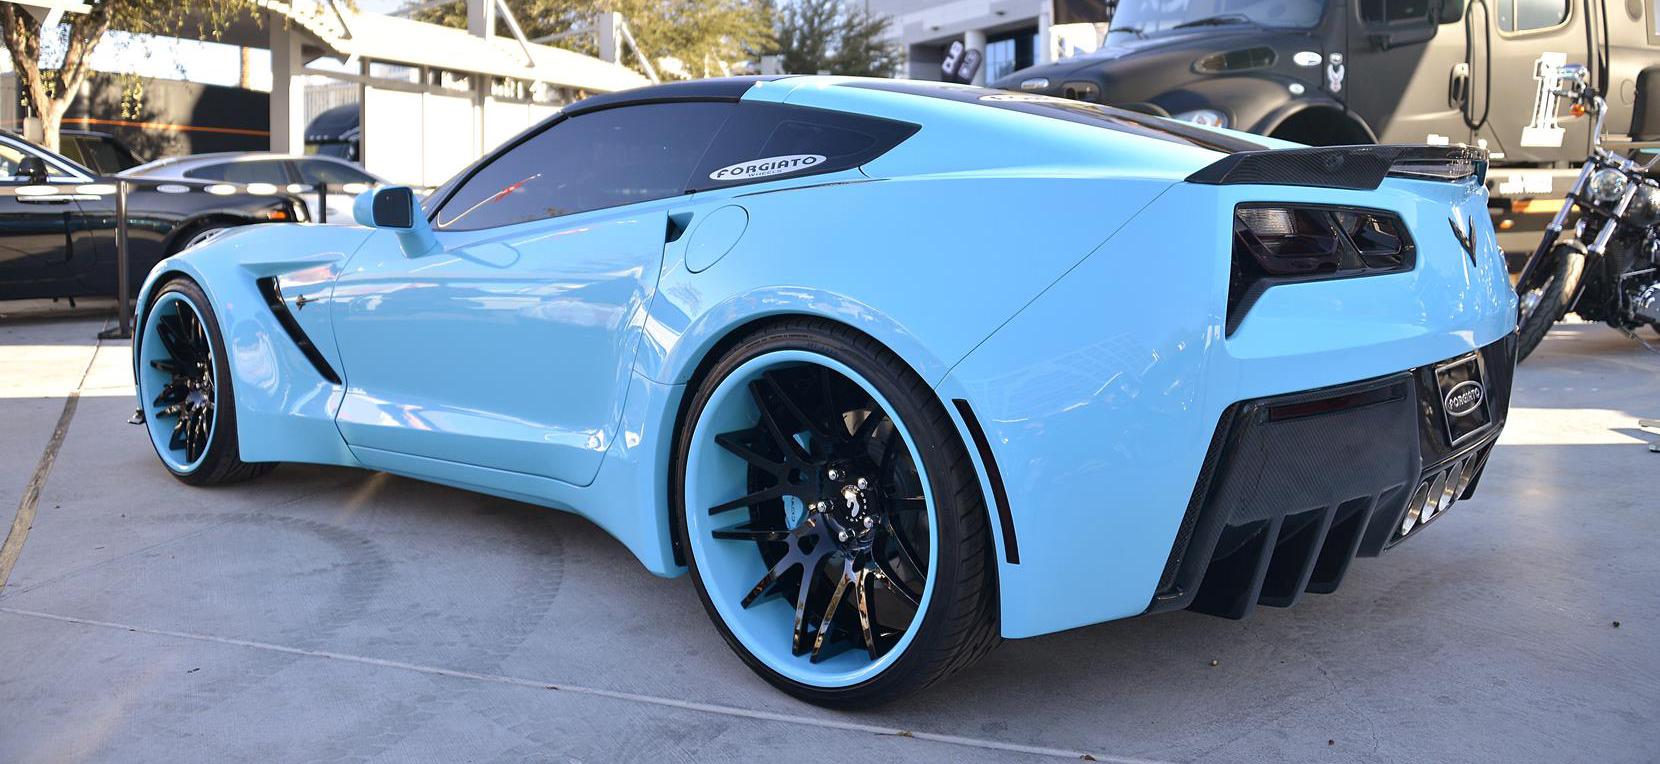 widebody-2014-corvette-stingray-by-forgiato-video_5